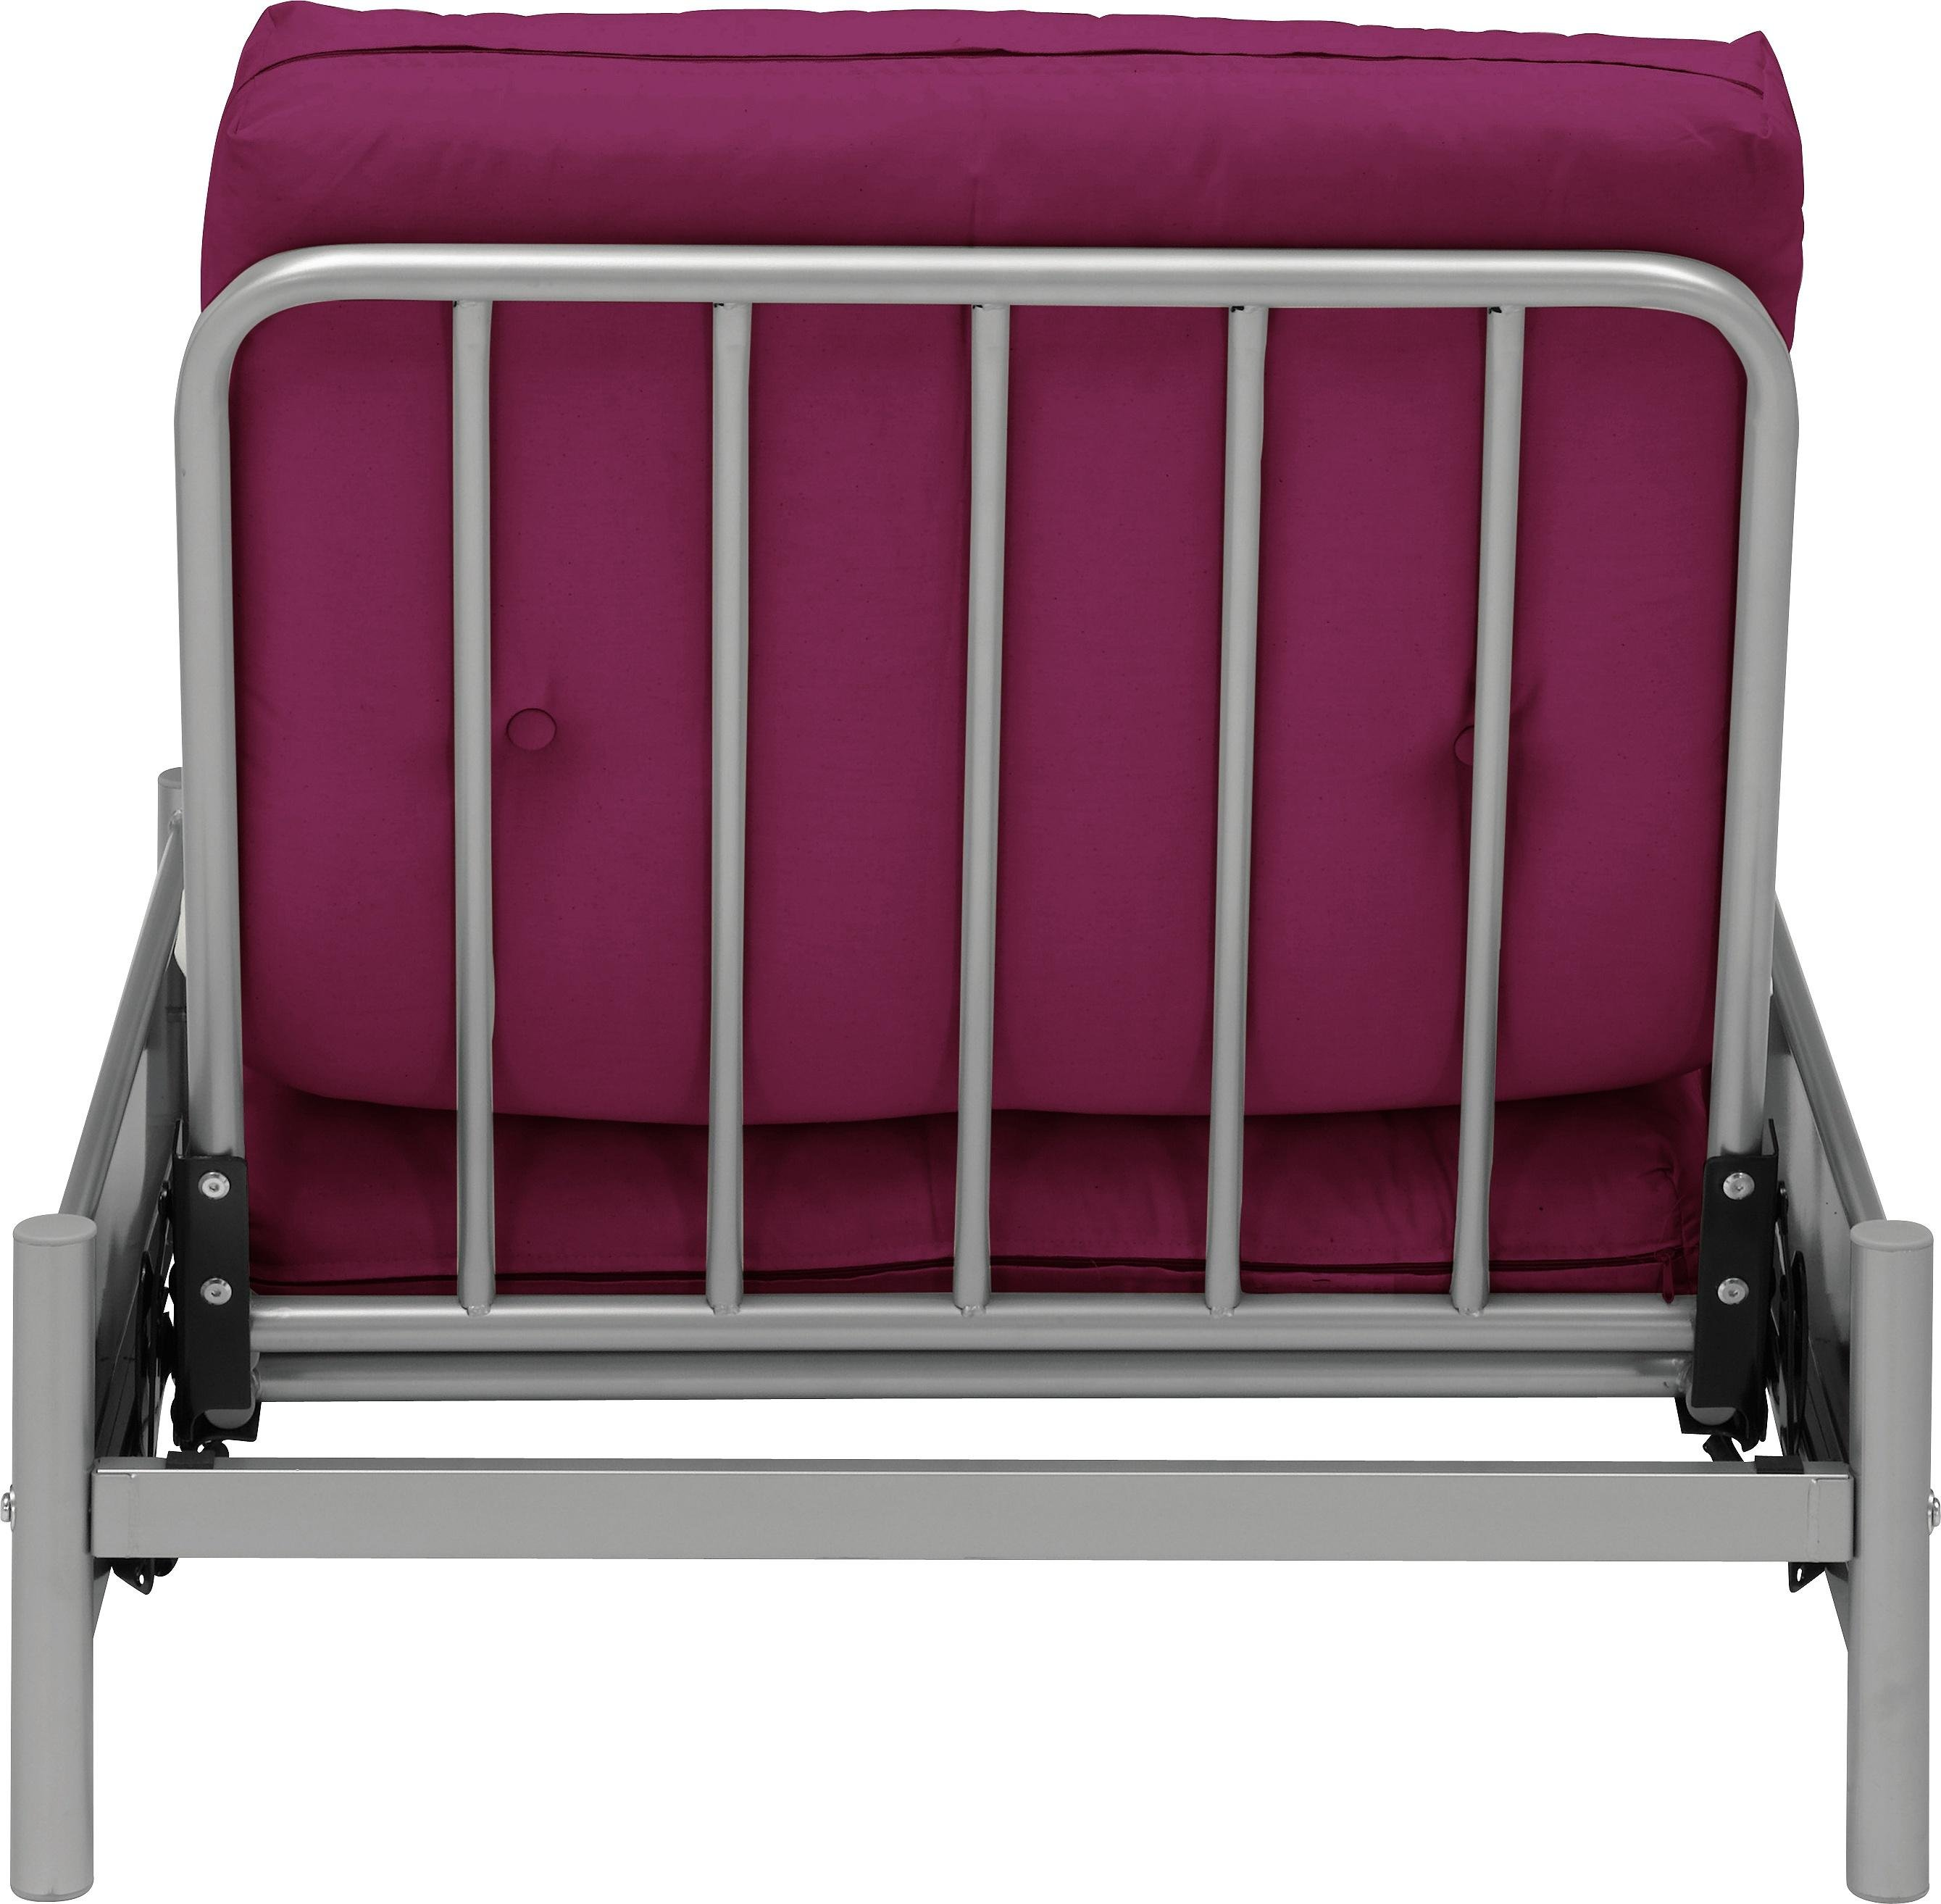 home single futon metal sofa bed with mattress purple with futon mattress argos  futon mattress argos  good futon mattress argos with futon      rh   homedepotoutdoorfurniture